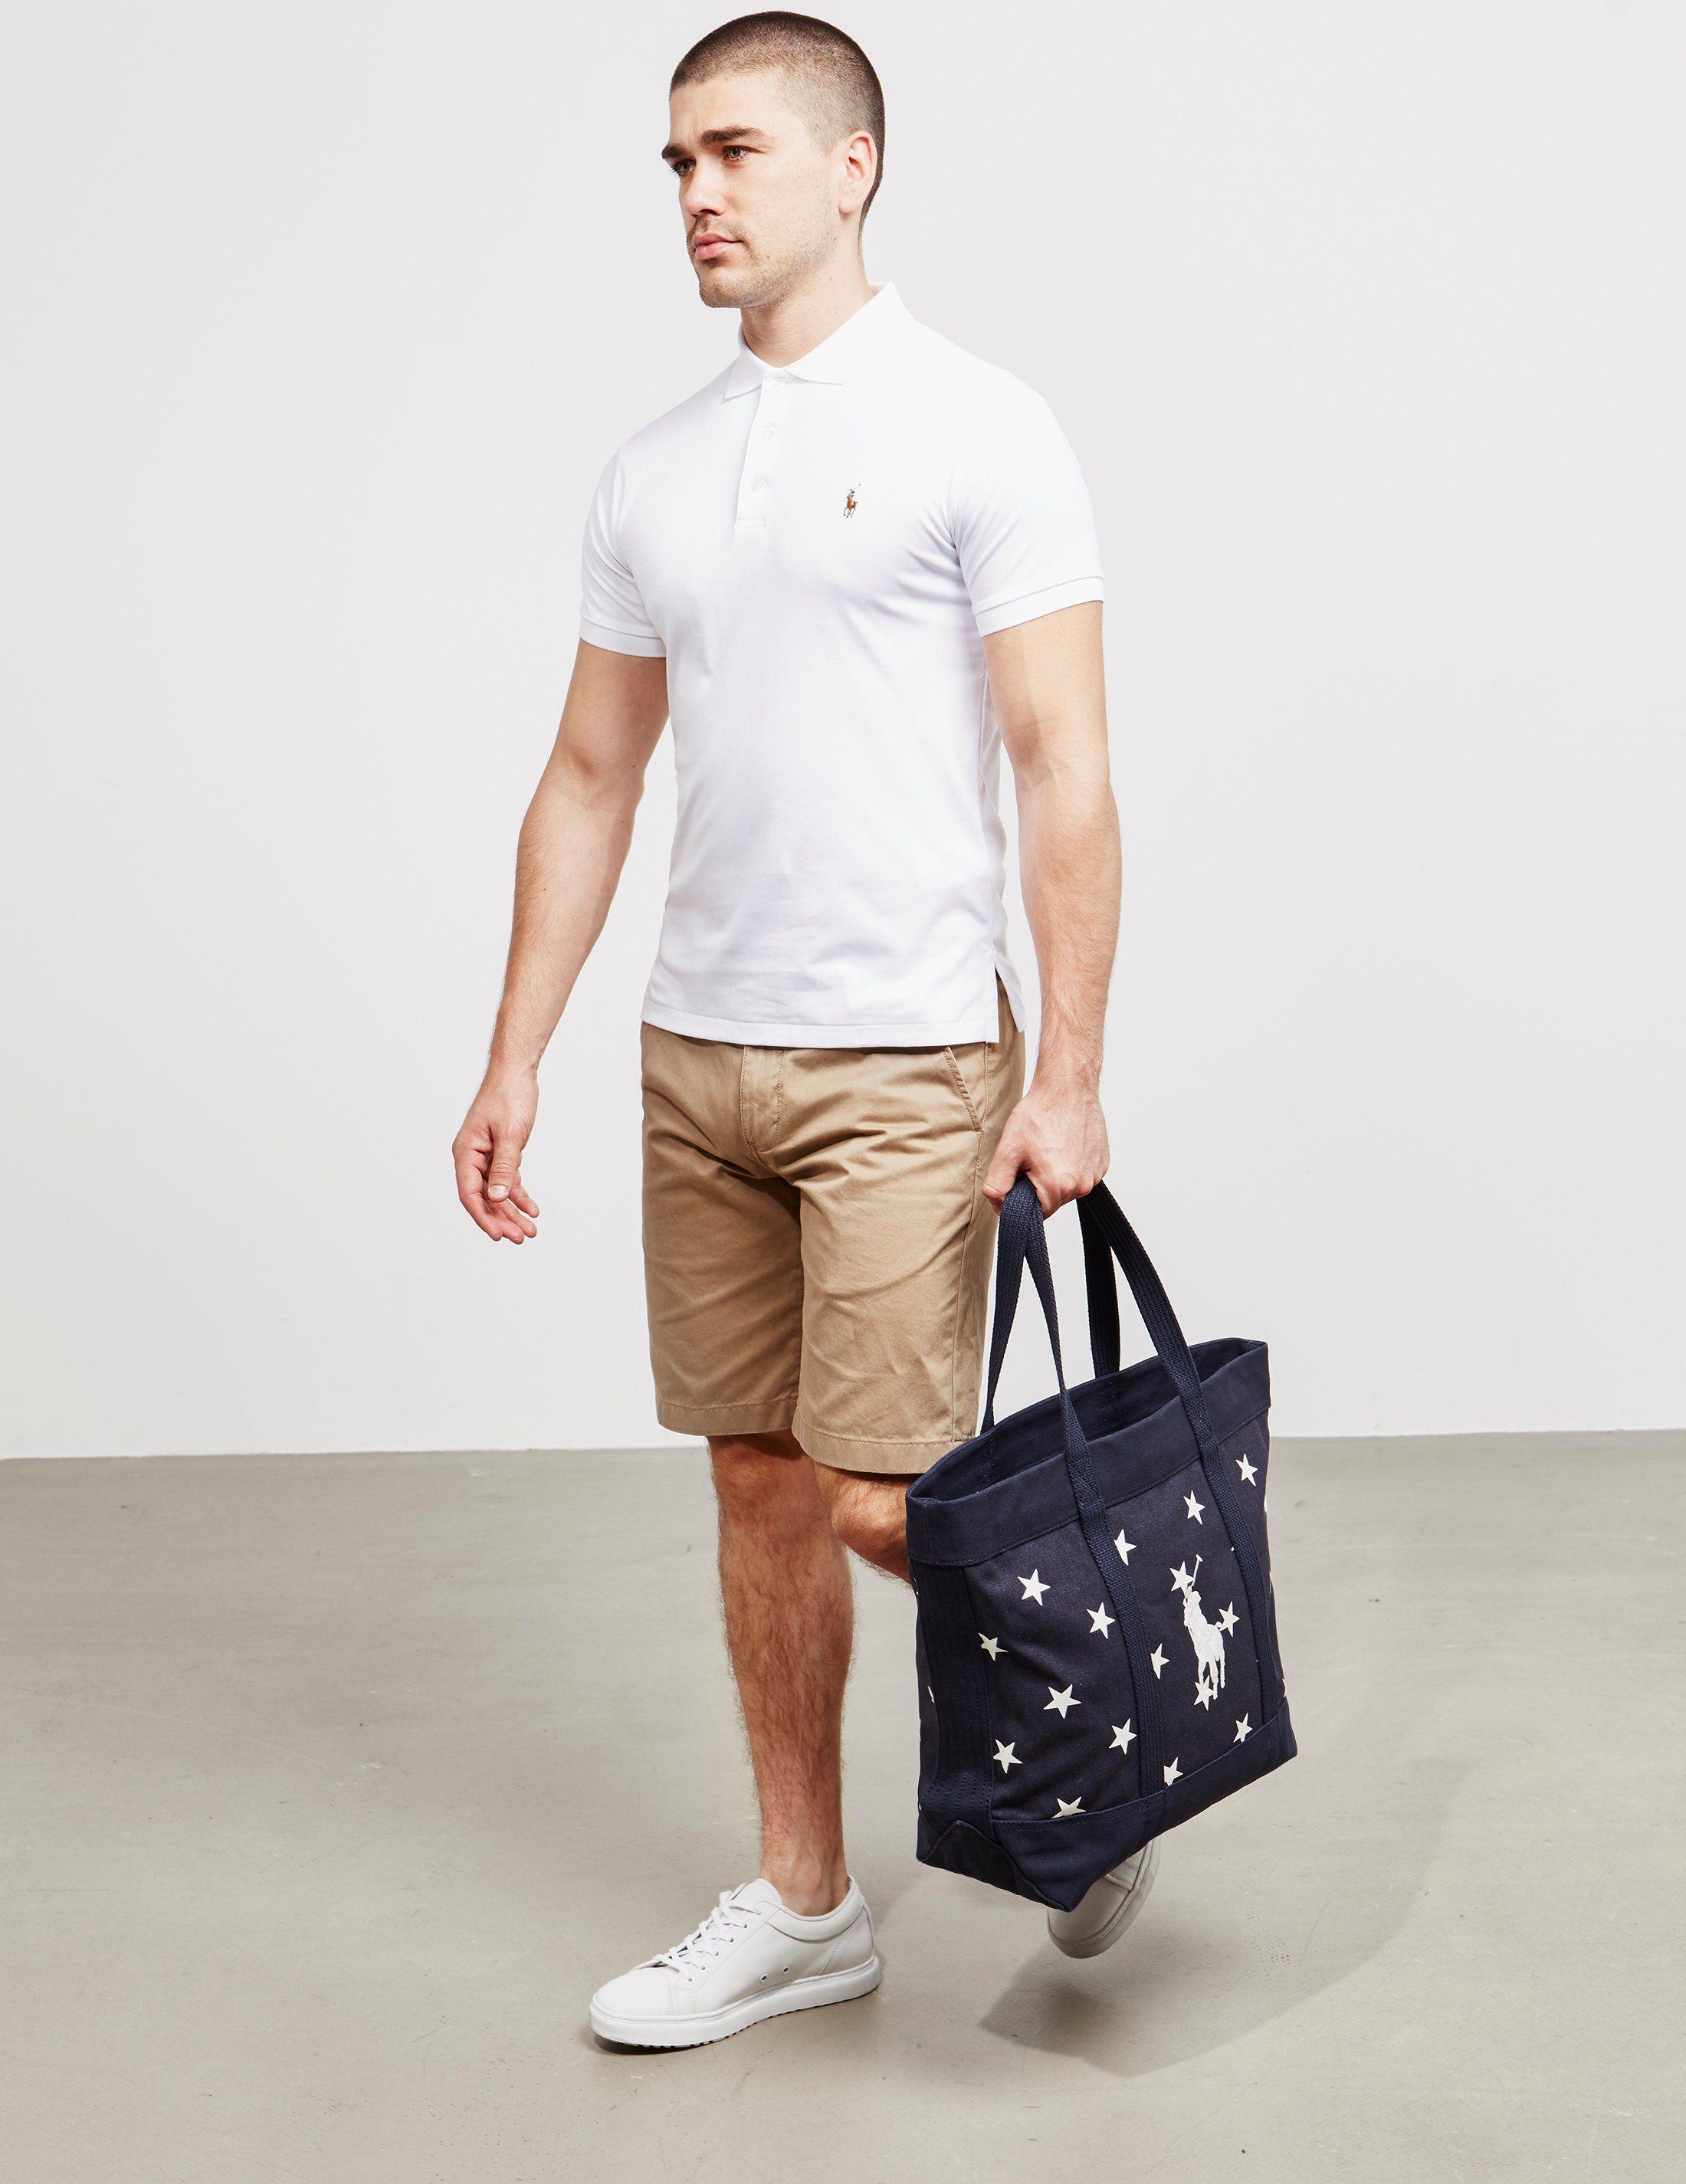 Polo Ralph Lauren Stars Tote Bag - Online Exclusive